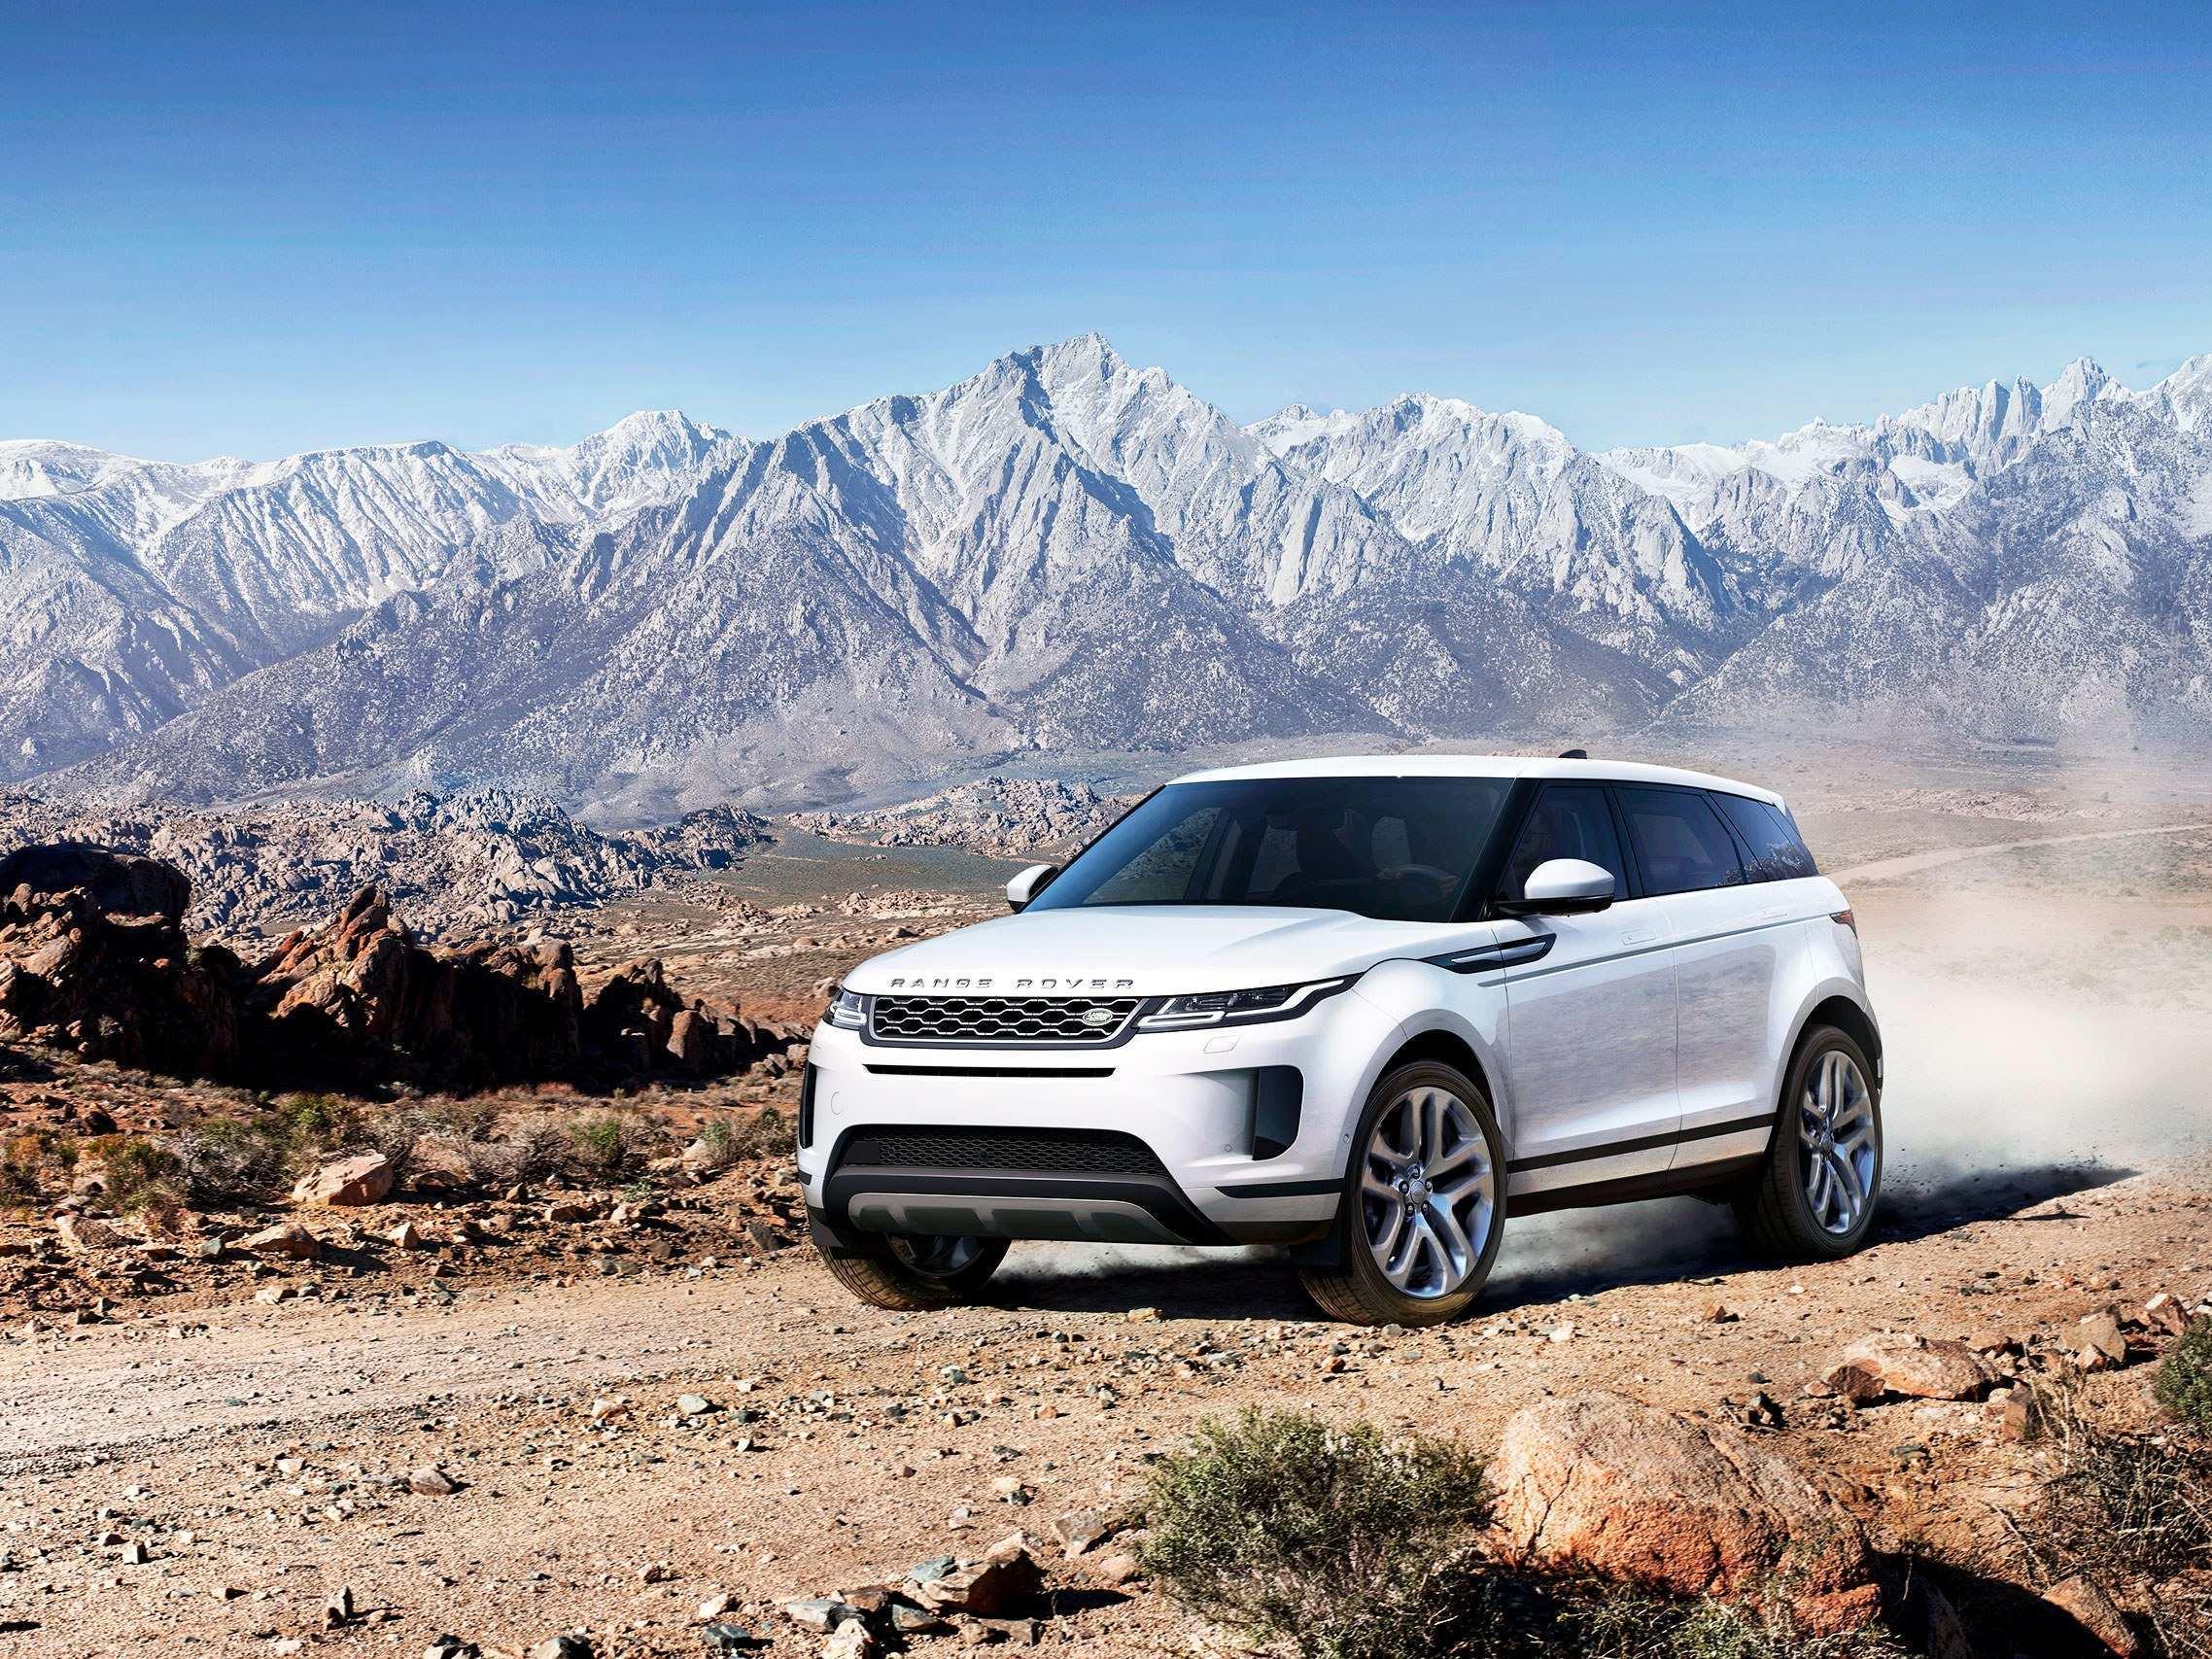 58 Best Review Jaguar Land Rover 2020 Vision New Concept with Jaguar Land Rover 2020 Vision